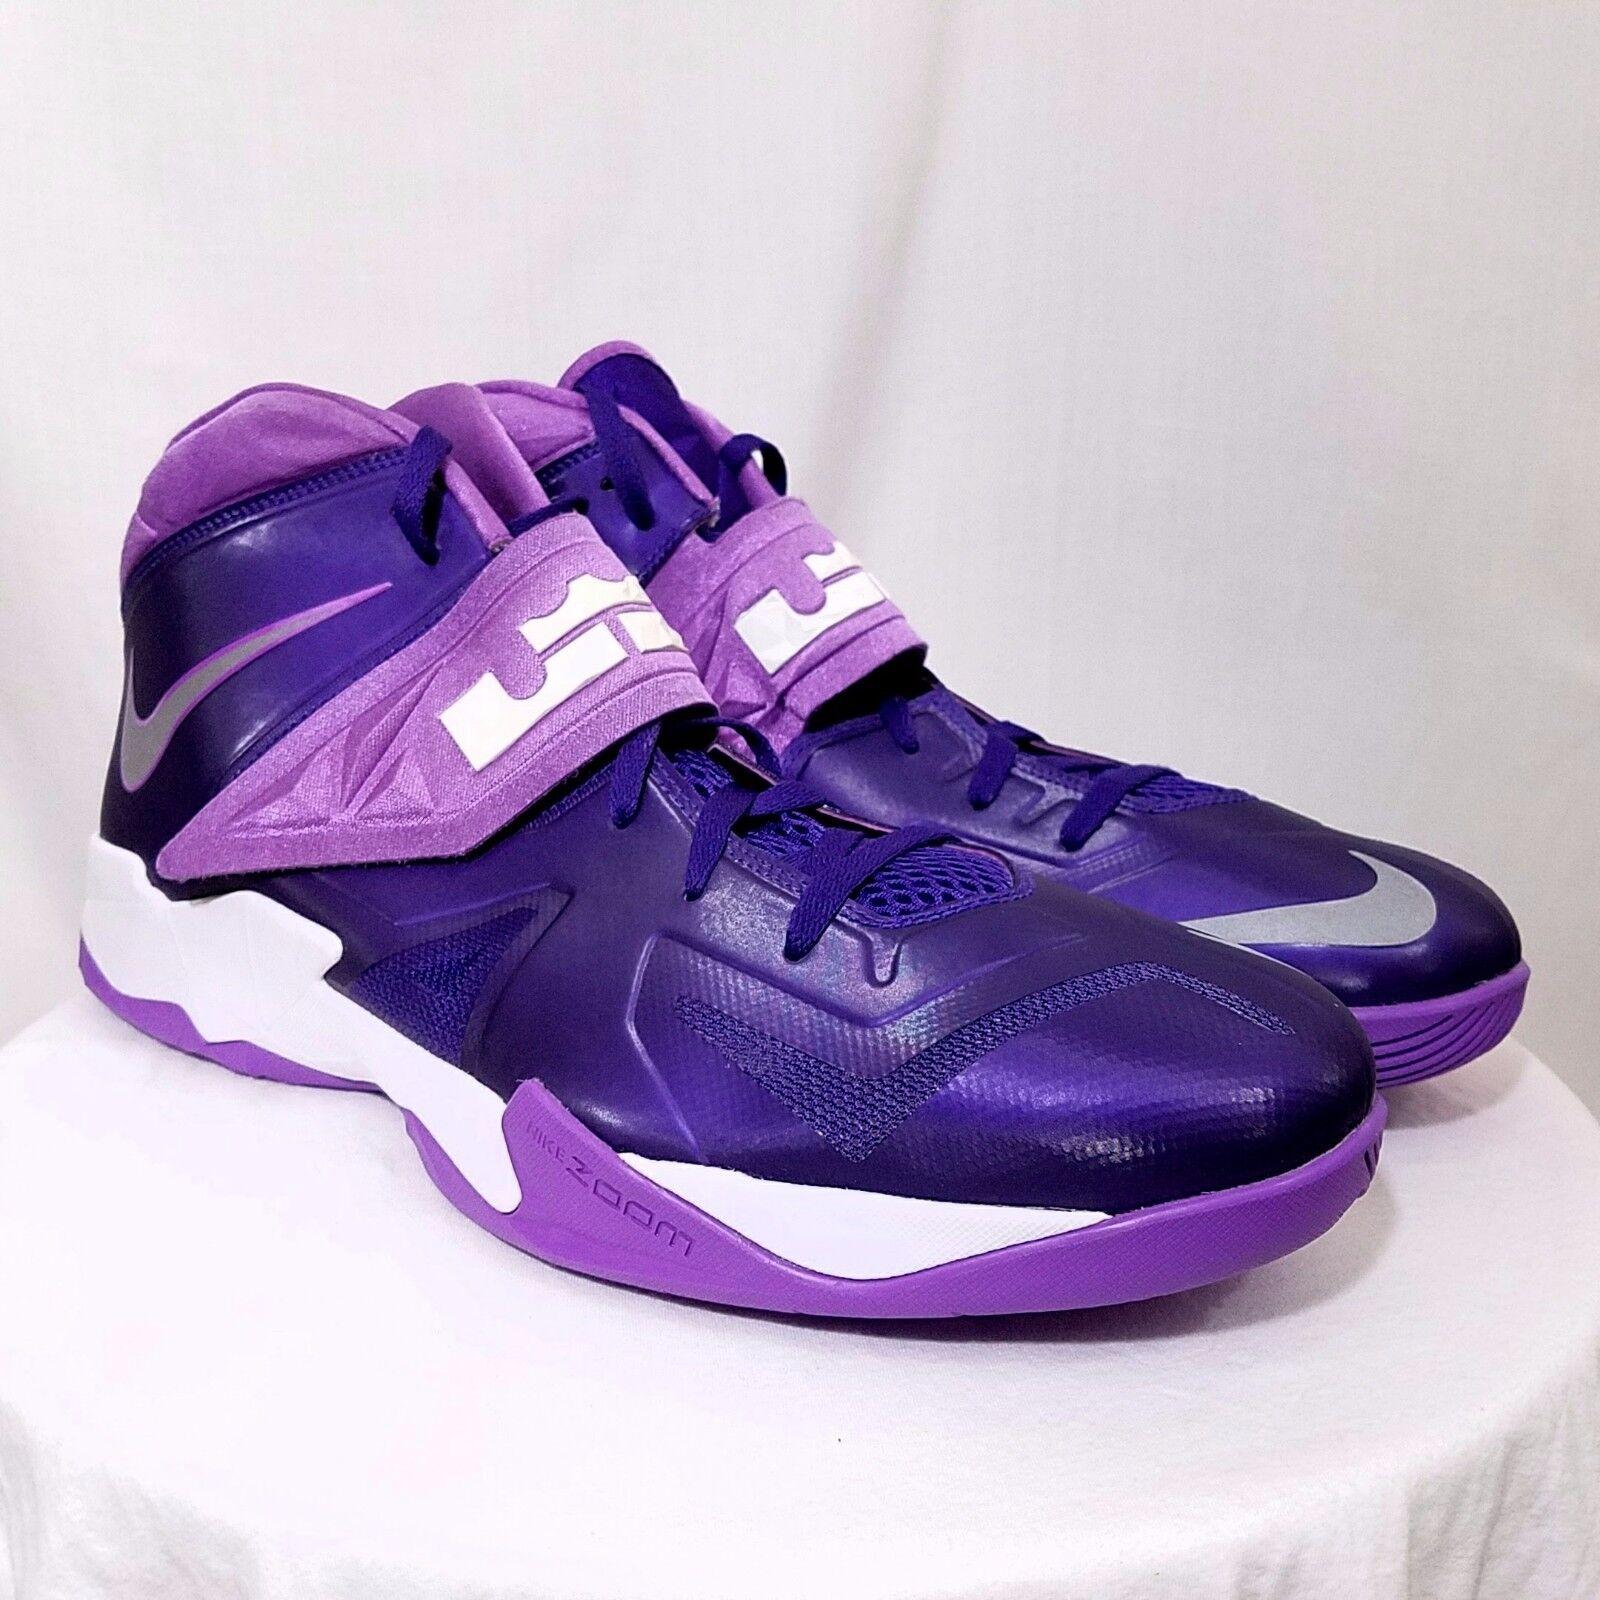 Nike ZOOM SOLDIER de VII TB Zapatos  de SOLDIER baloncesto LeBron James 599263 500 US 16.5 4704be